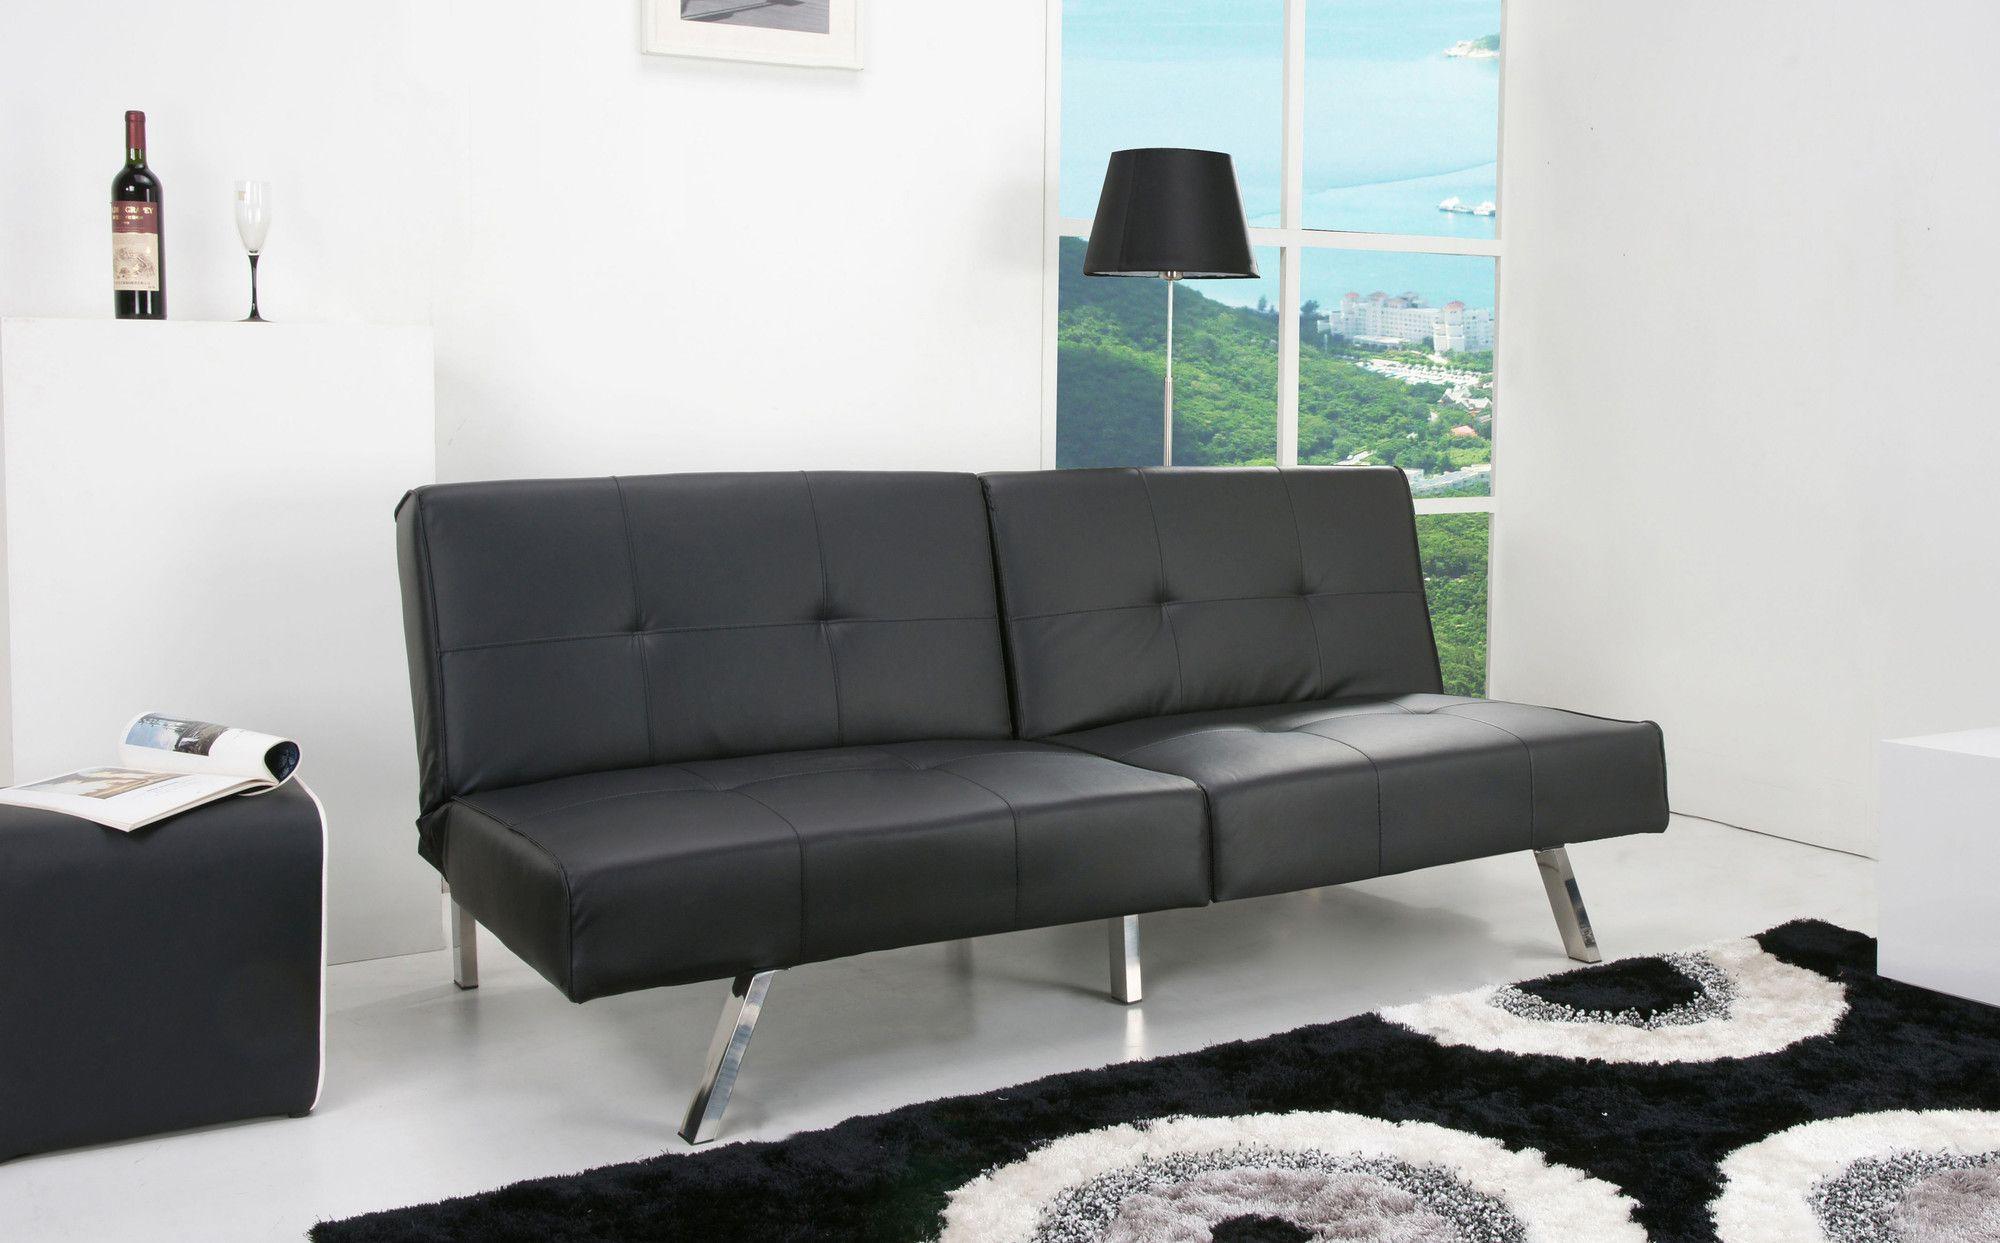 Rosehill Futon Sofa Bed